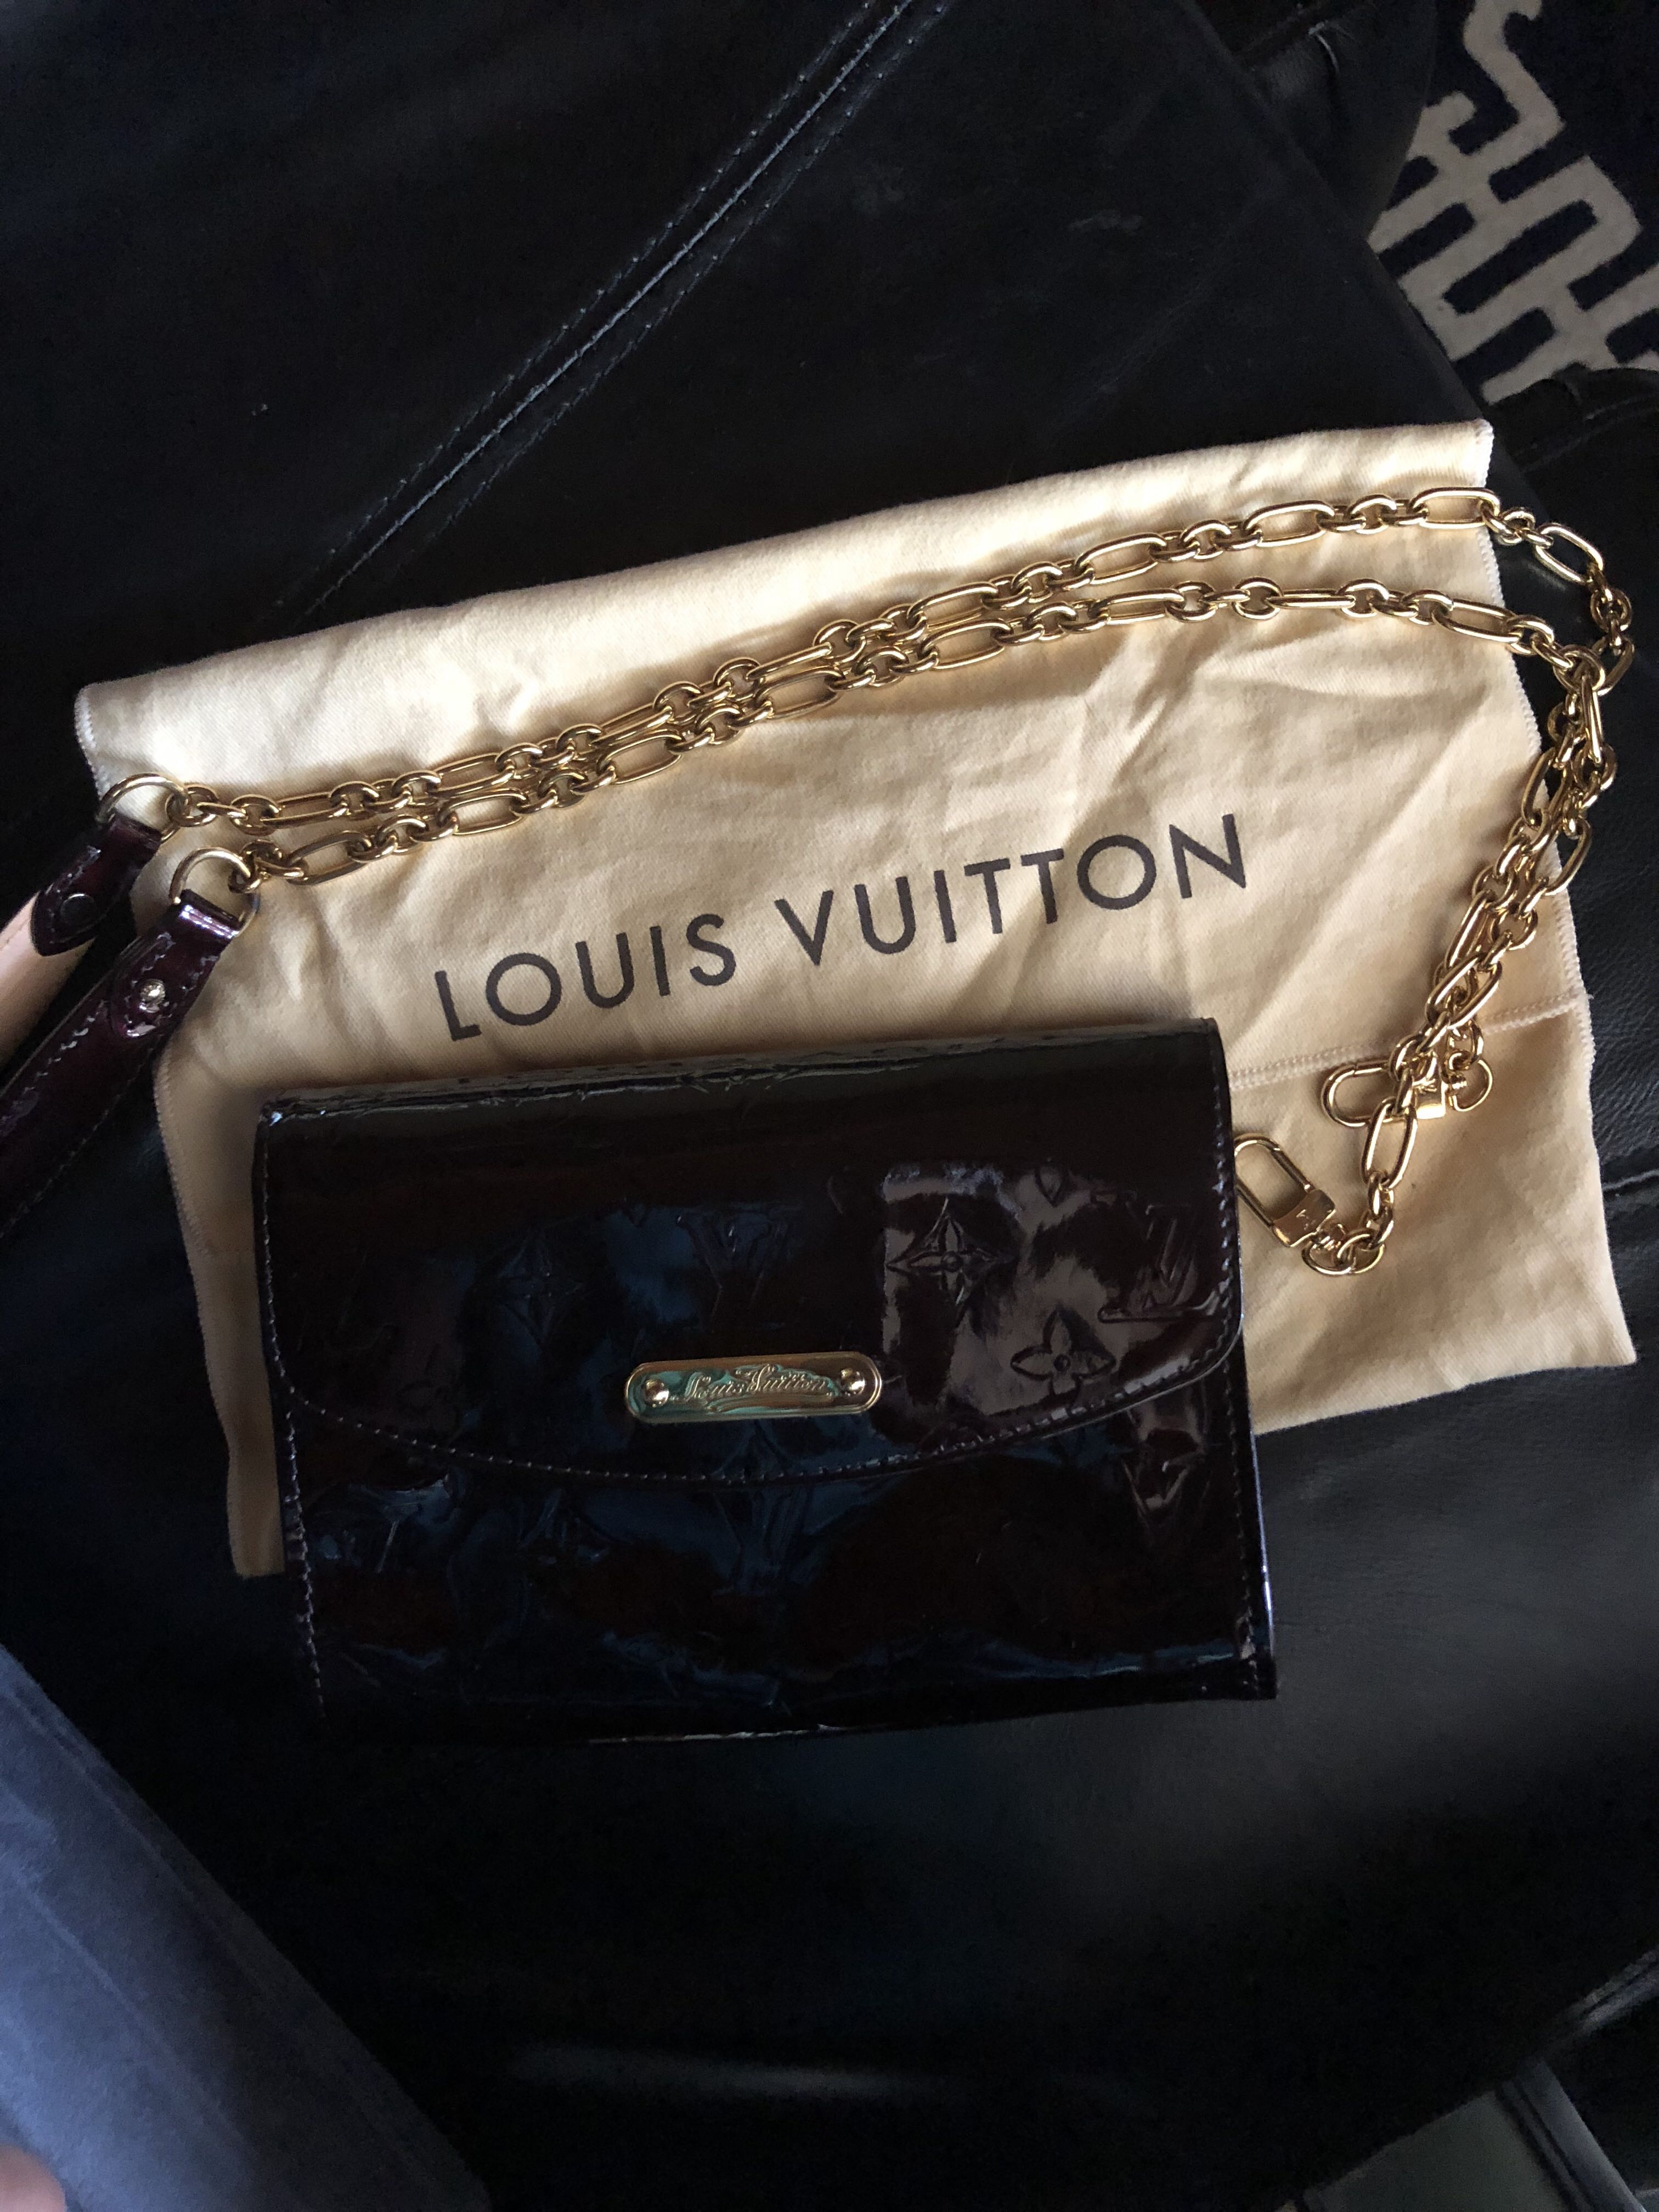 Authentic Louis Vuitton Amarante Monogram Vernis Bel Air pochette handbag